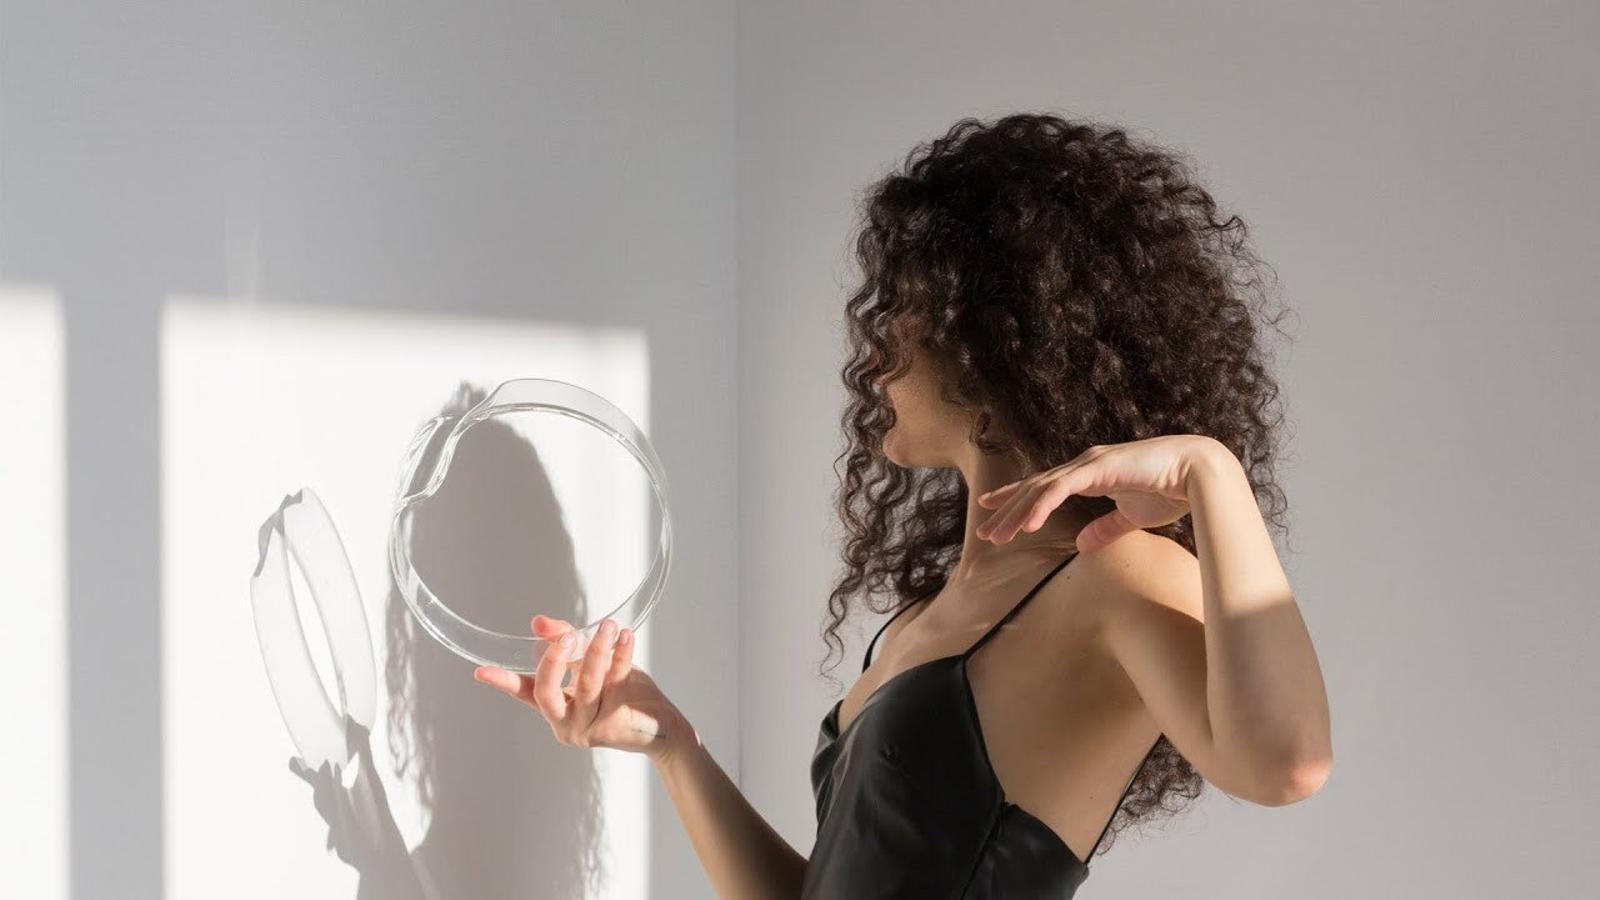 Marta Cascales, 'Vuelo', videoclip